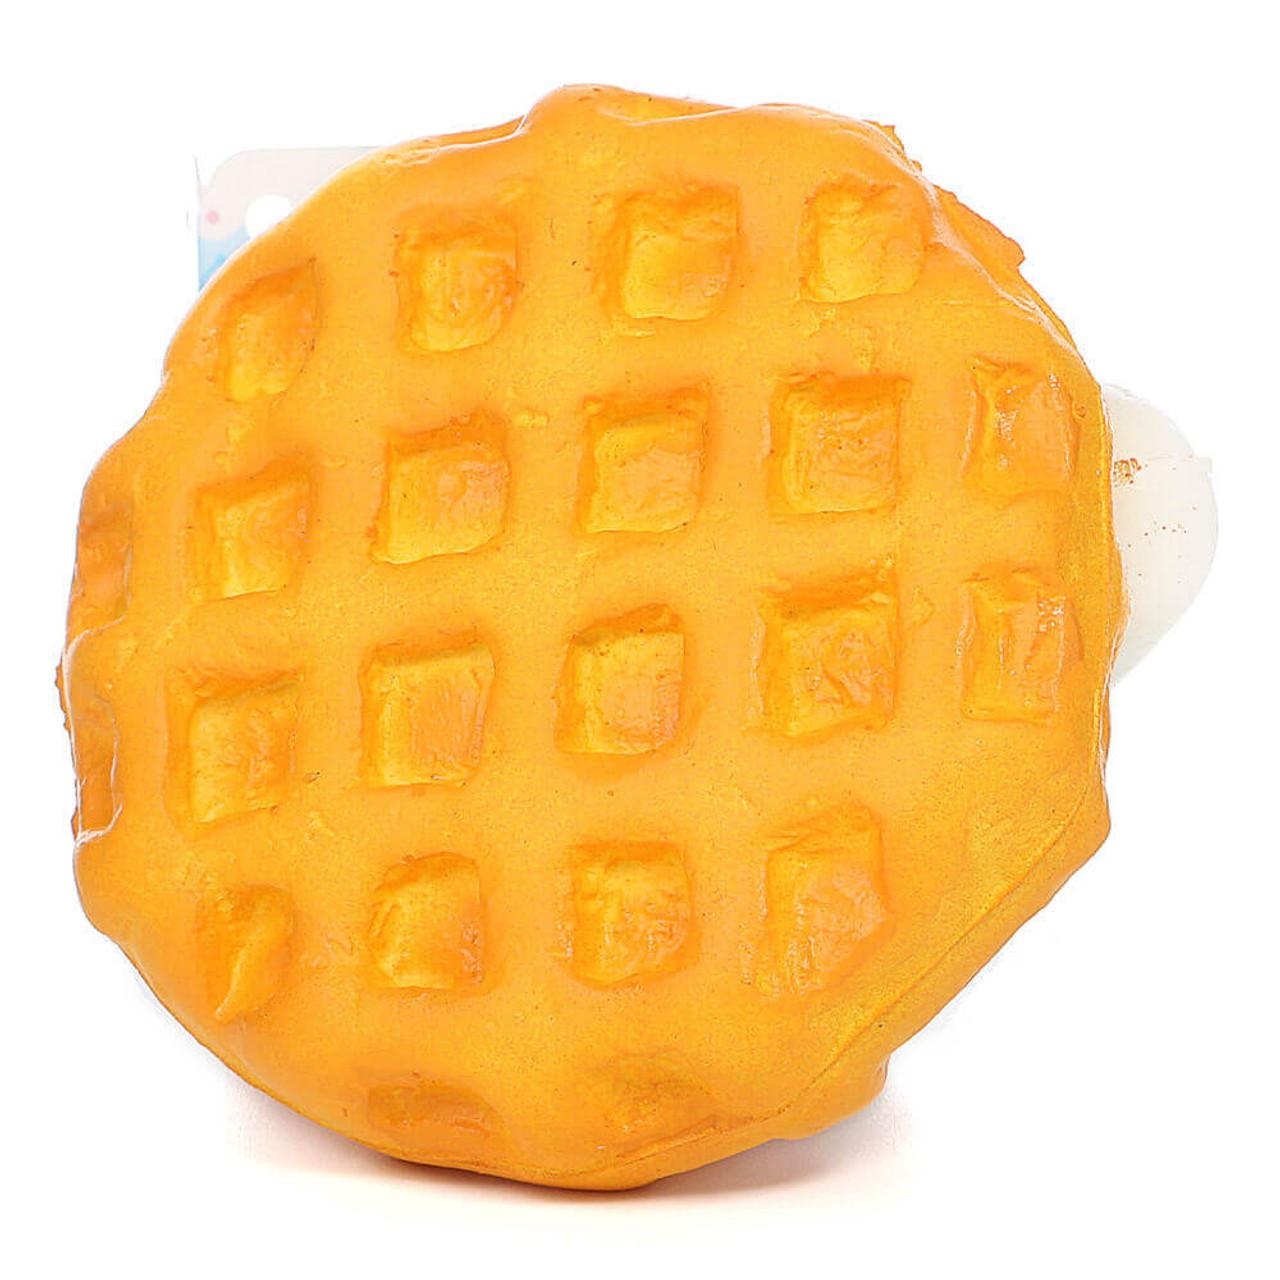 Sanrio Cinnamoroll Kawaii Mascot Waffle Cream Dessert Soft Squishy Charms ( Bottom View )